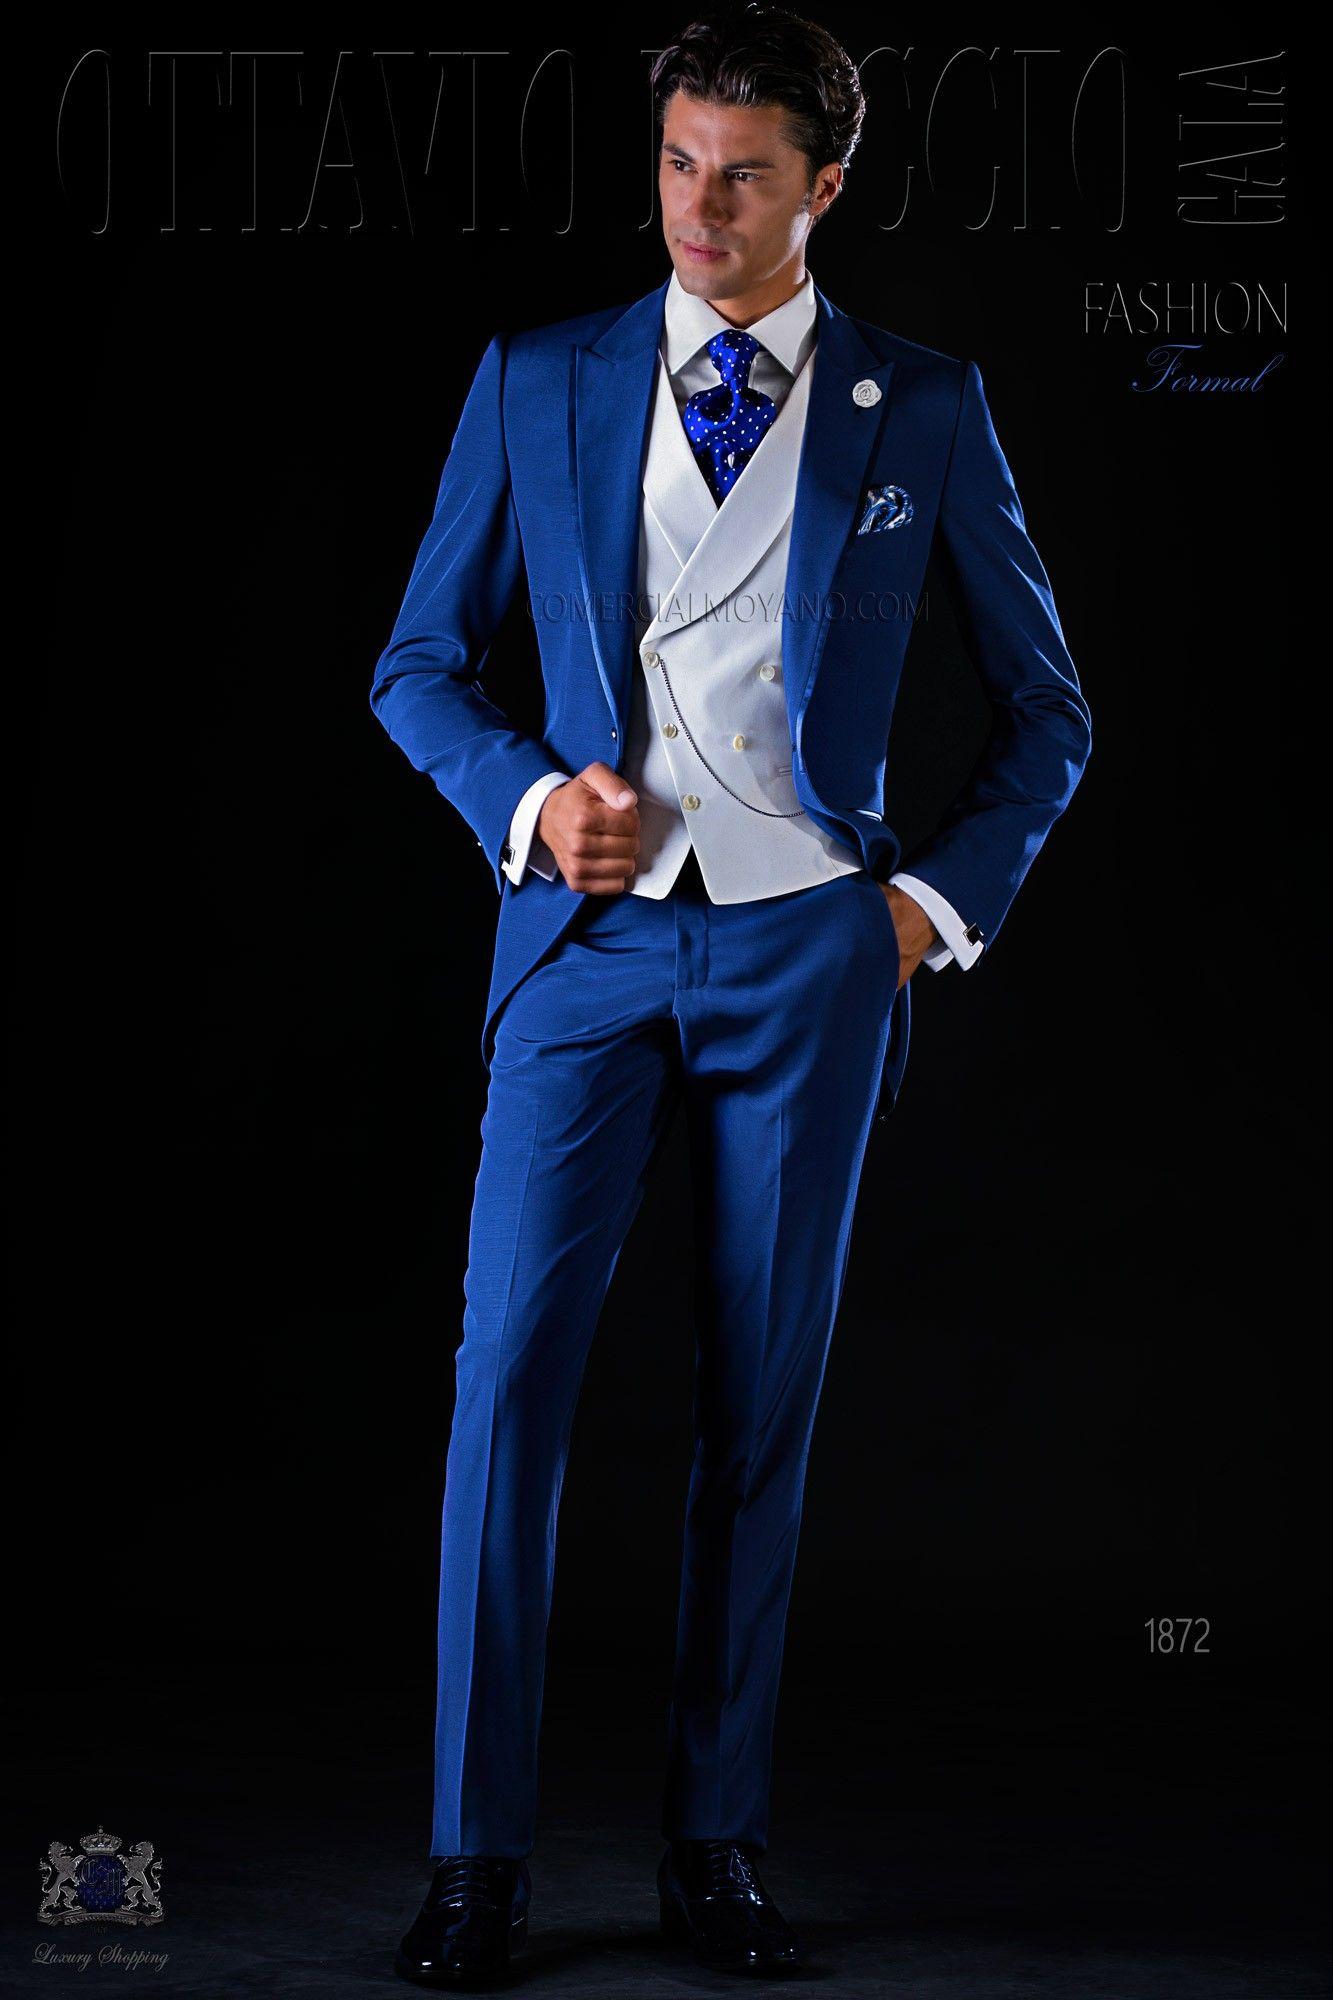 Royal blaue Gehrock Brutigam Anzug mit Satin Kontrast